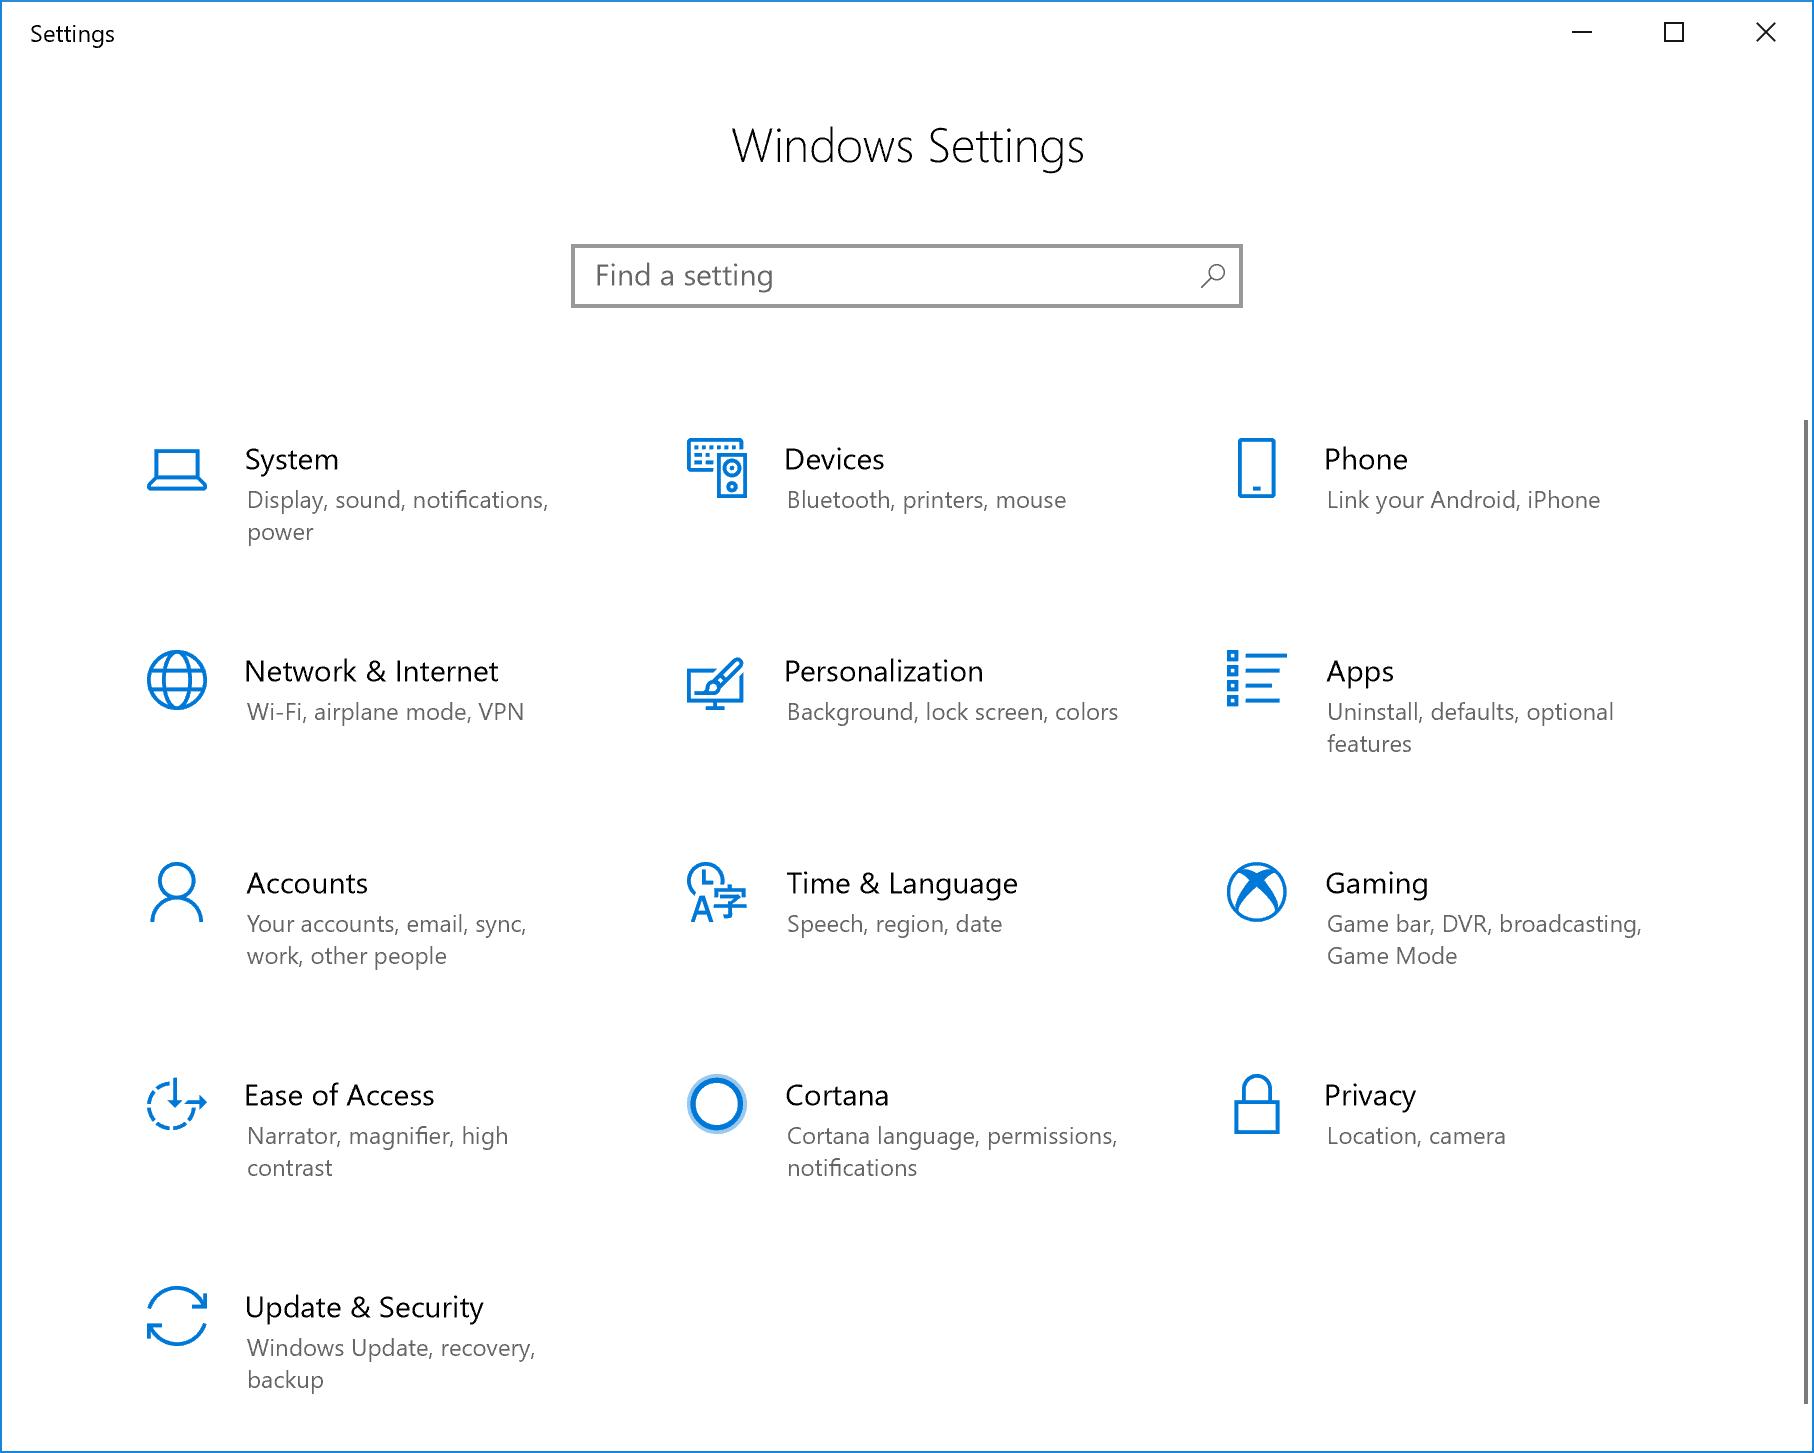 Quickstart - Enroll your Windows 10 Desktop device in Microsoft